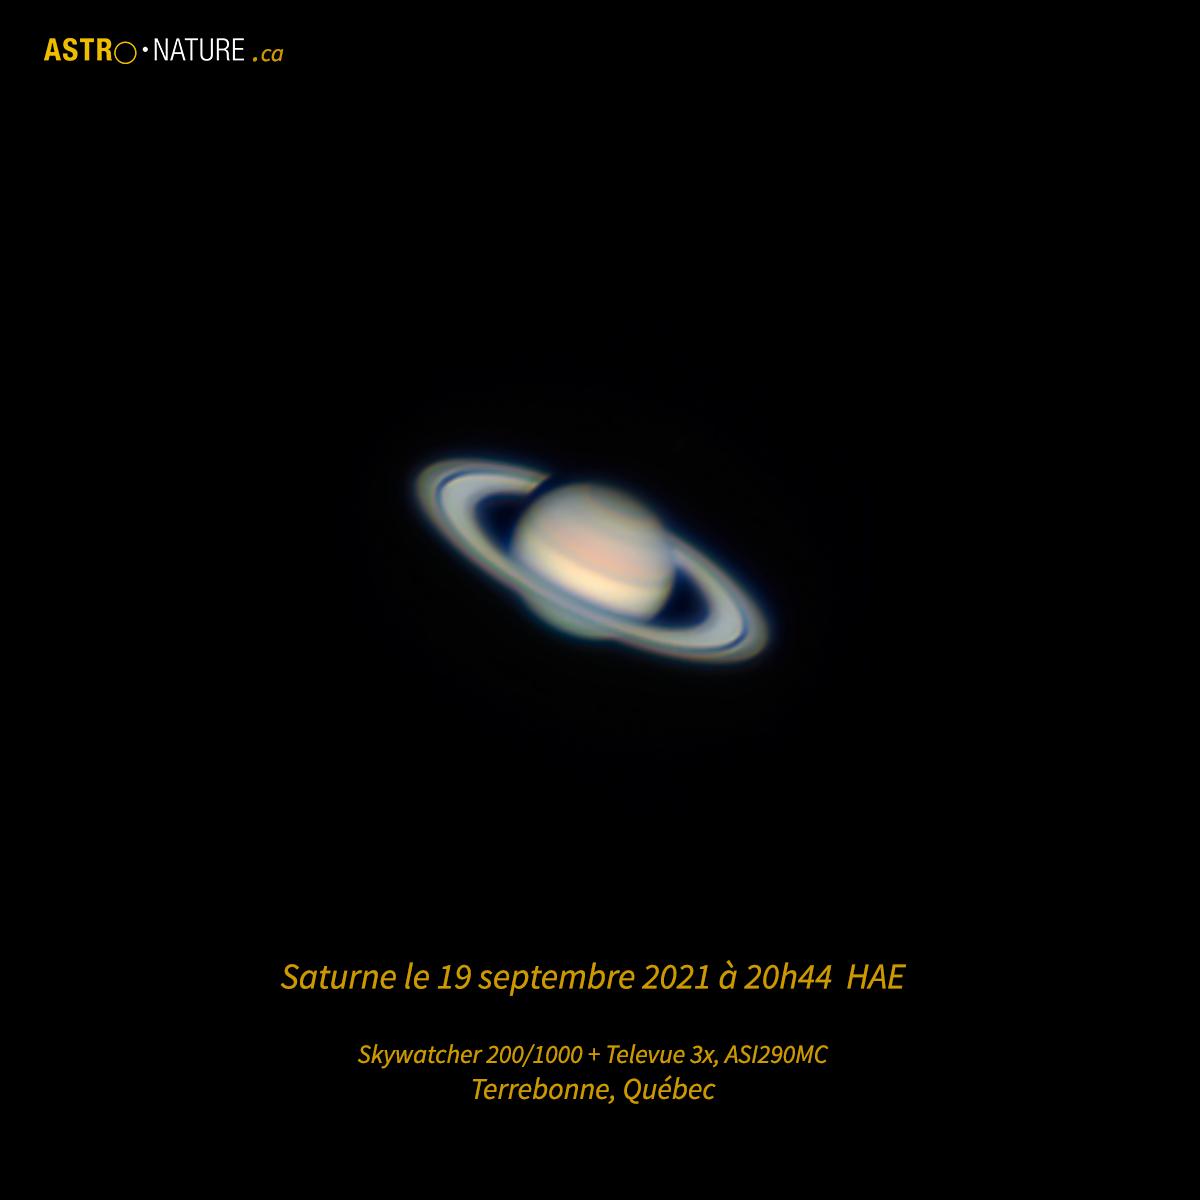 2021-09-20-0044SaturneFinale.png.d9de49438ad6d83f5d0e2e976b5d4307.png